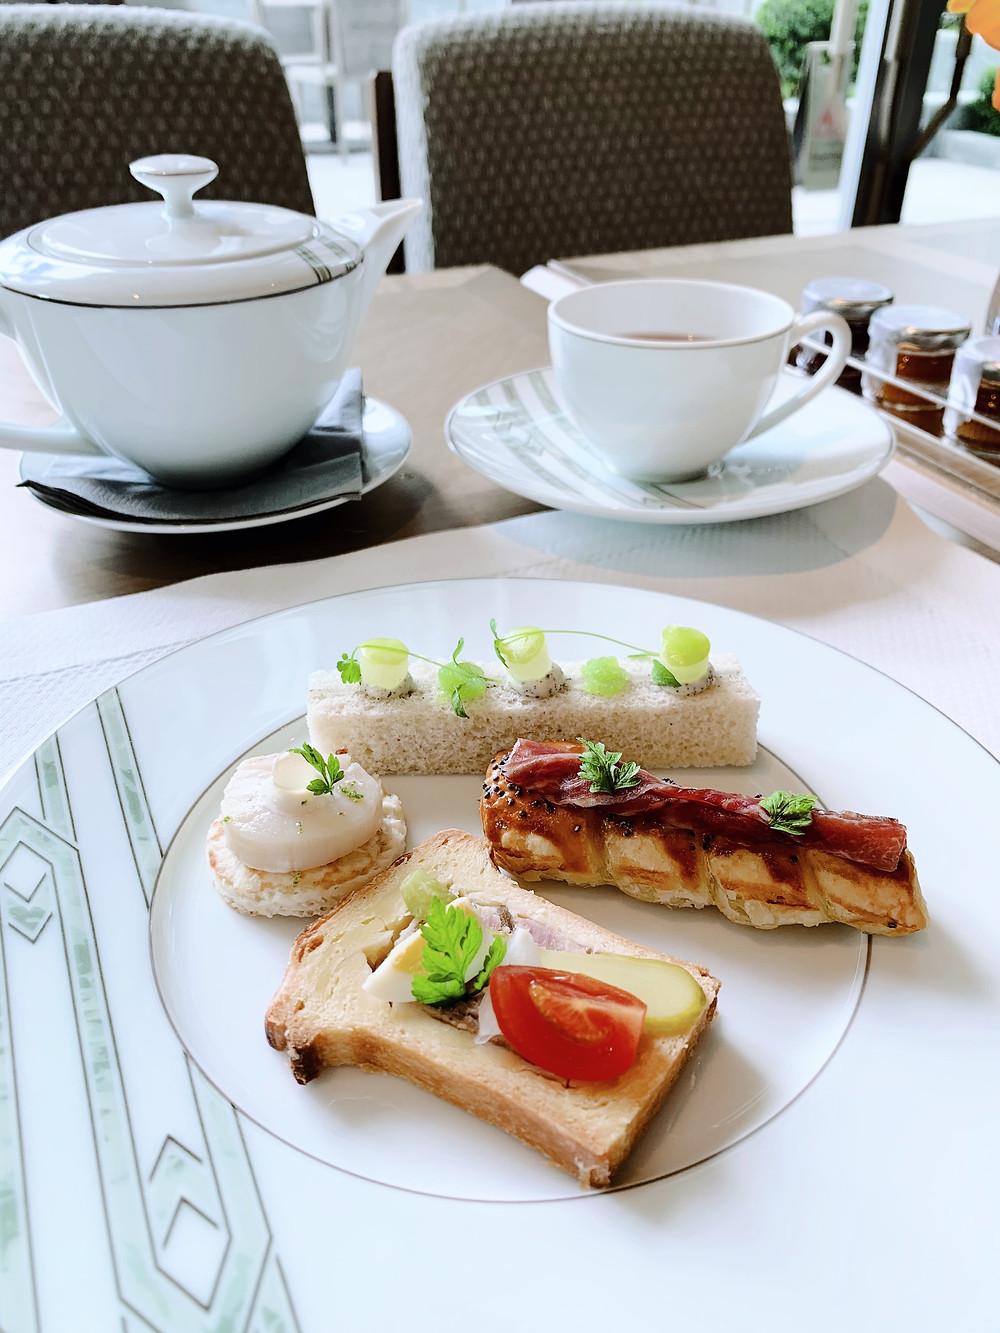 Afternoon tea at St Regis HK Hong Kong